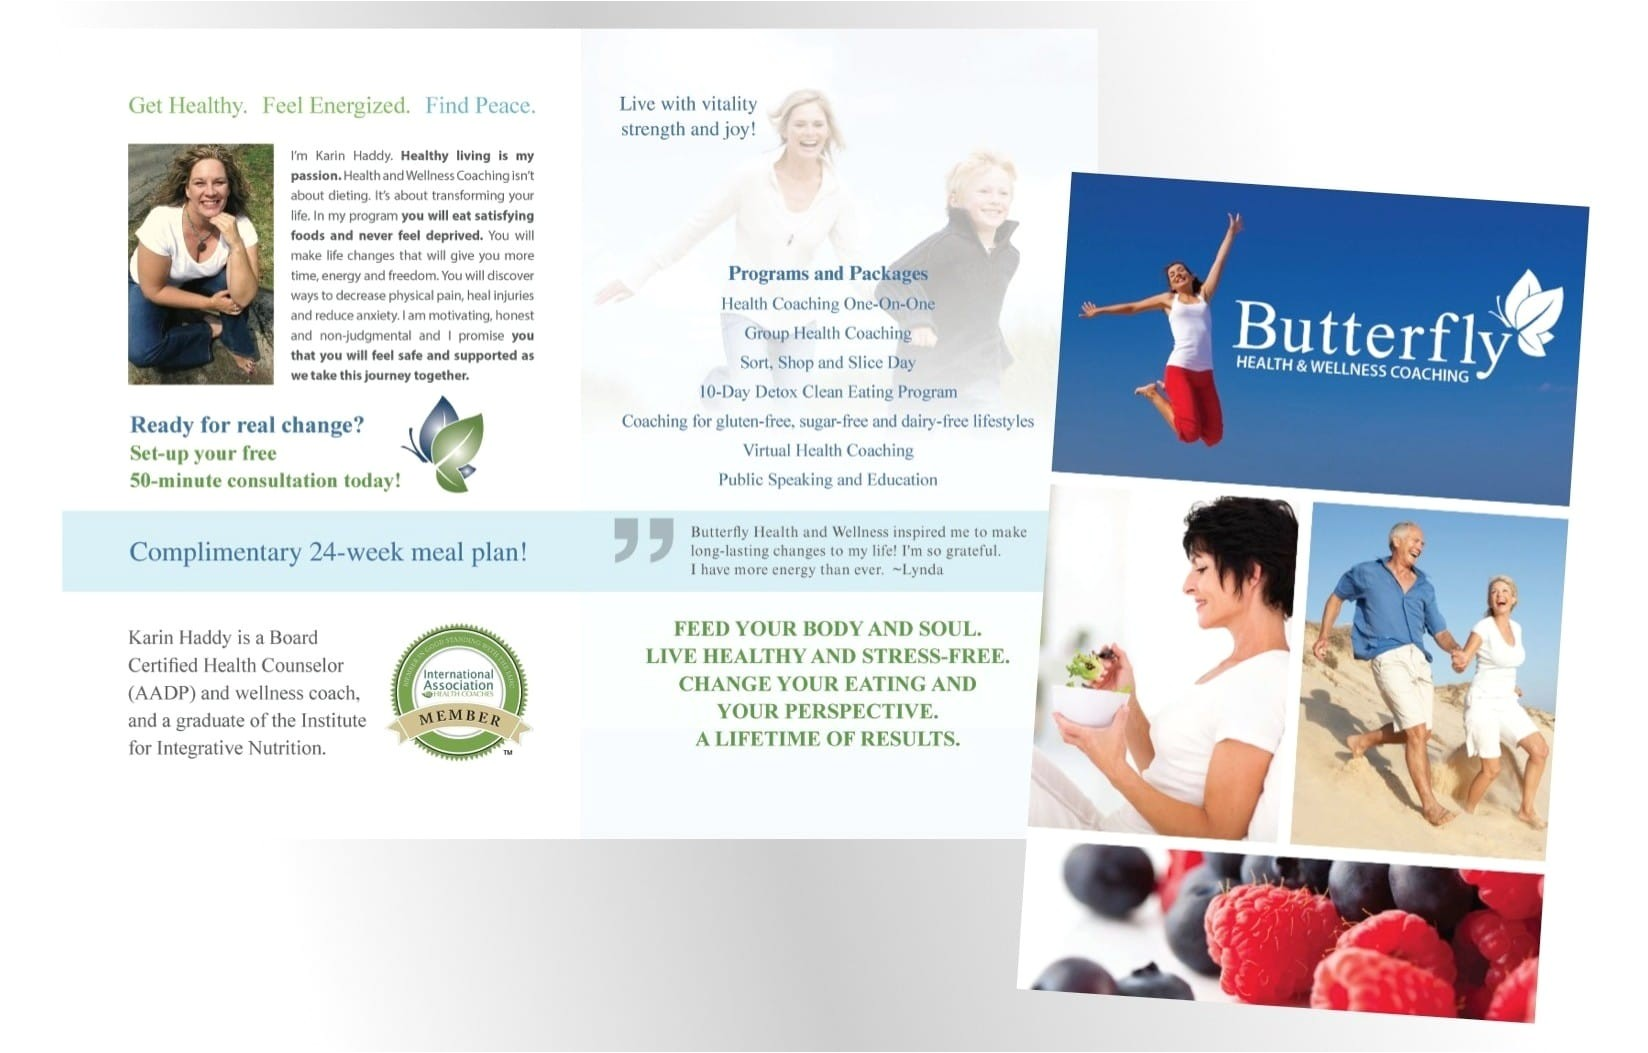 butterfly health wellness coaching rebrand rapunzel creative marketing